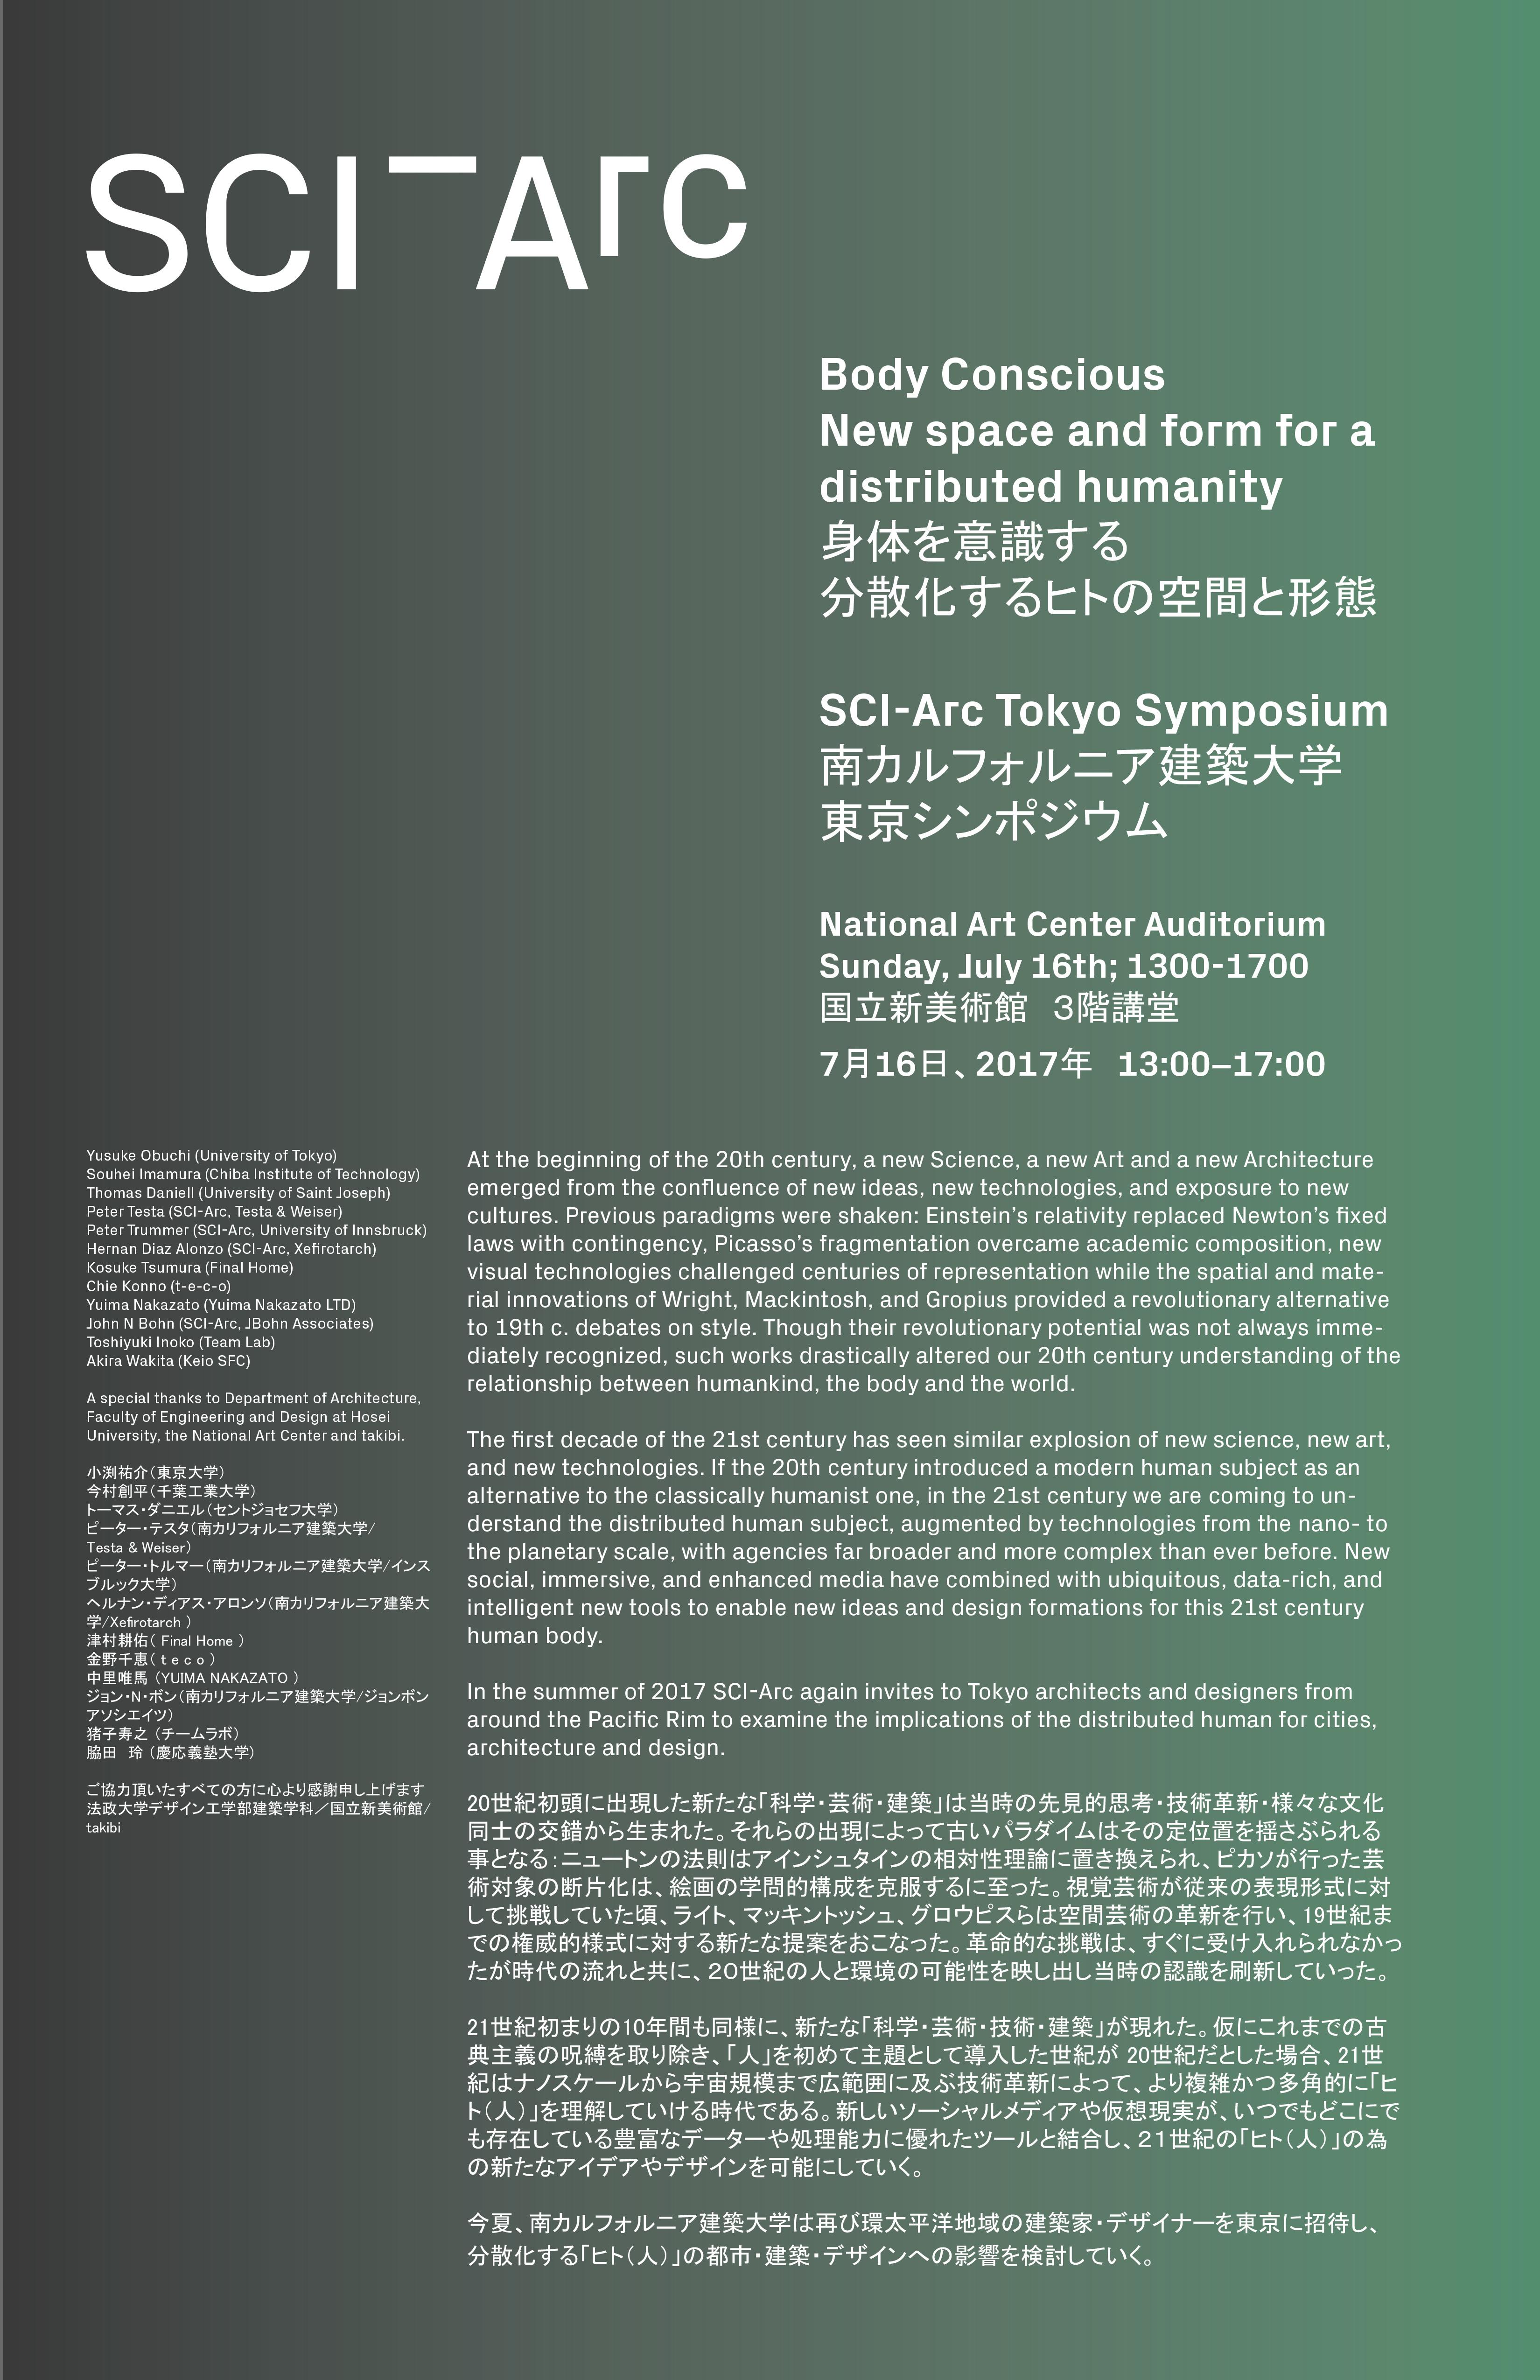 170715_Tokyo_Symposium_2